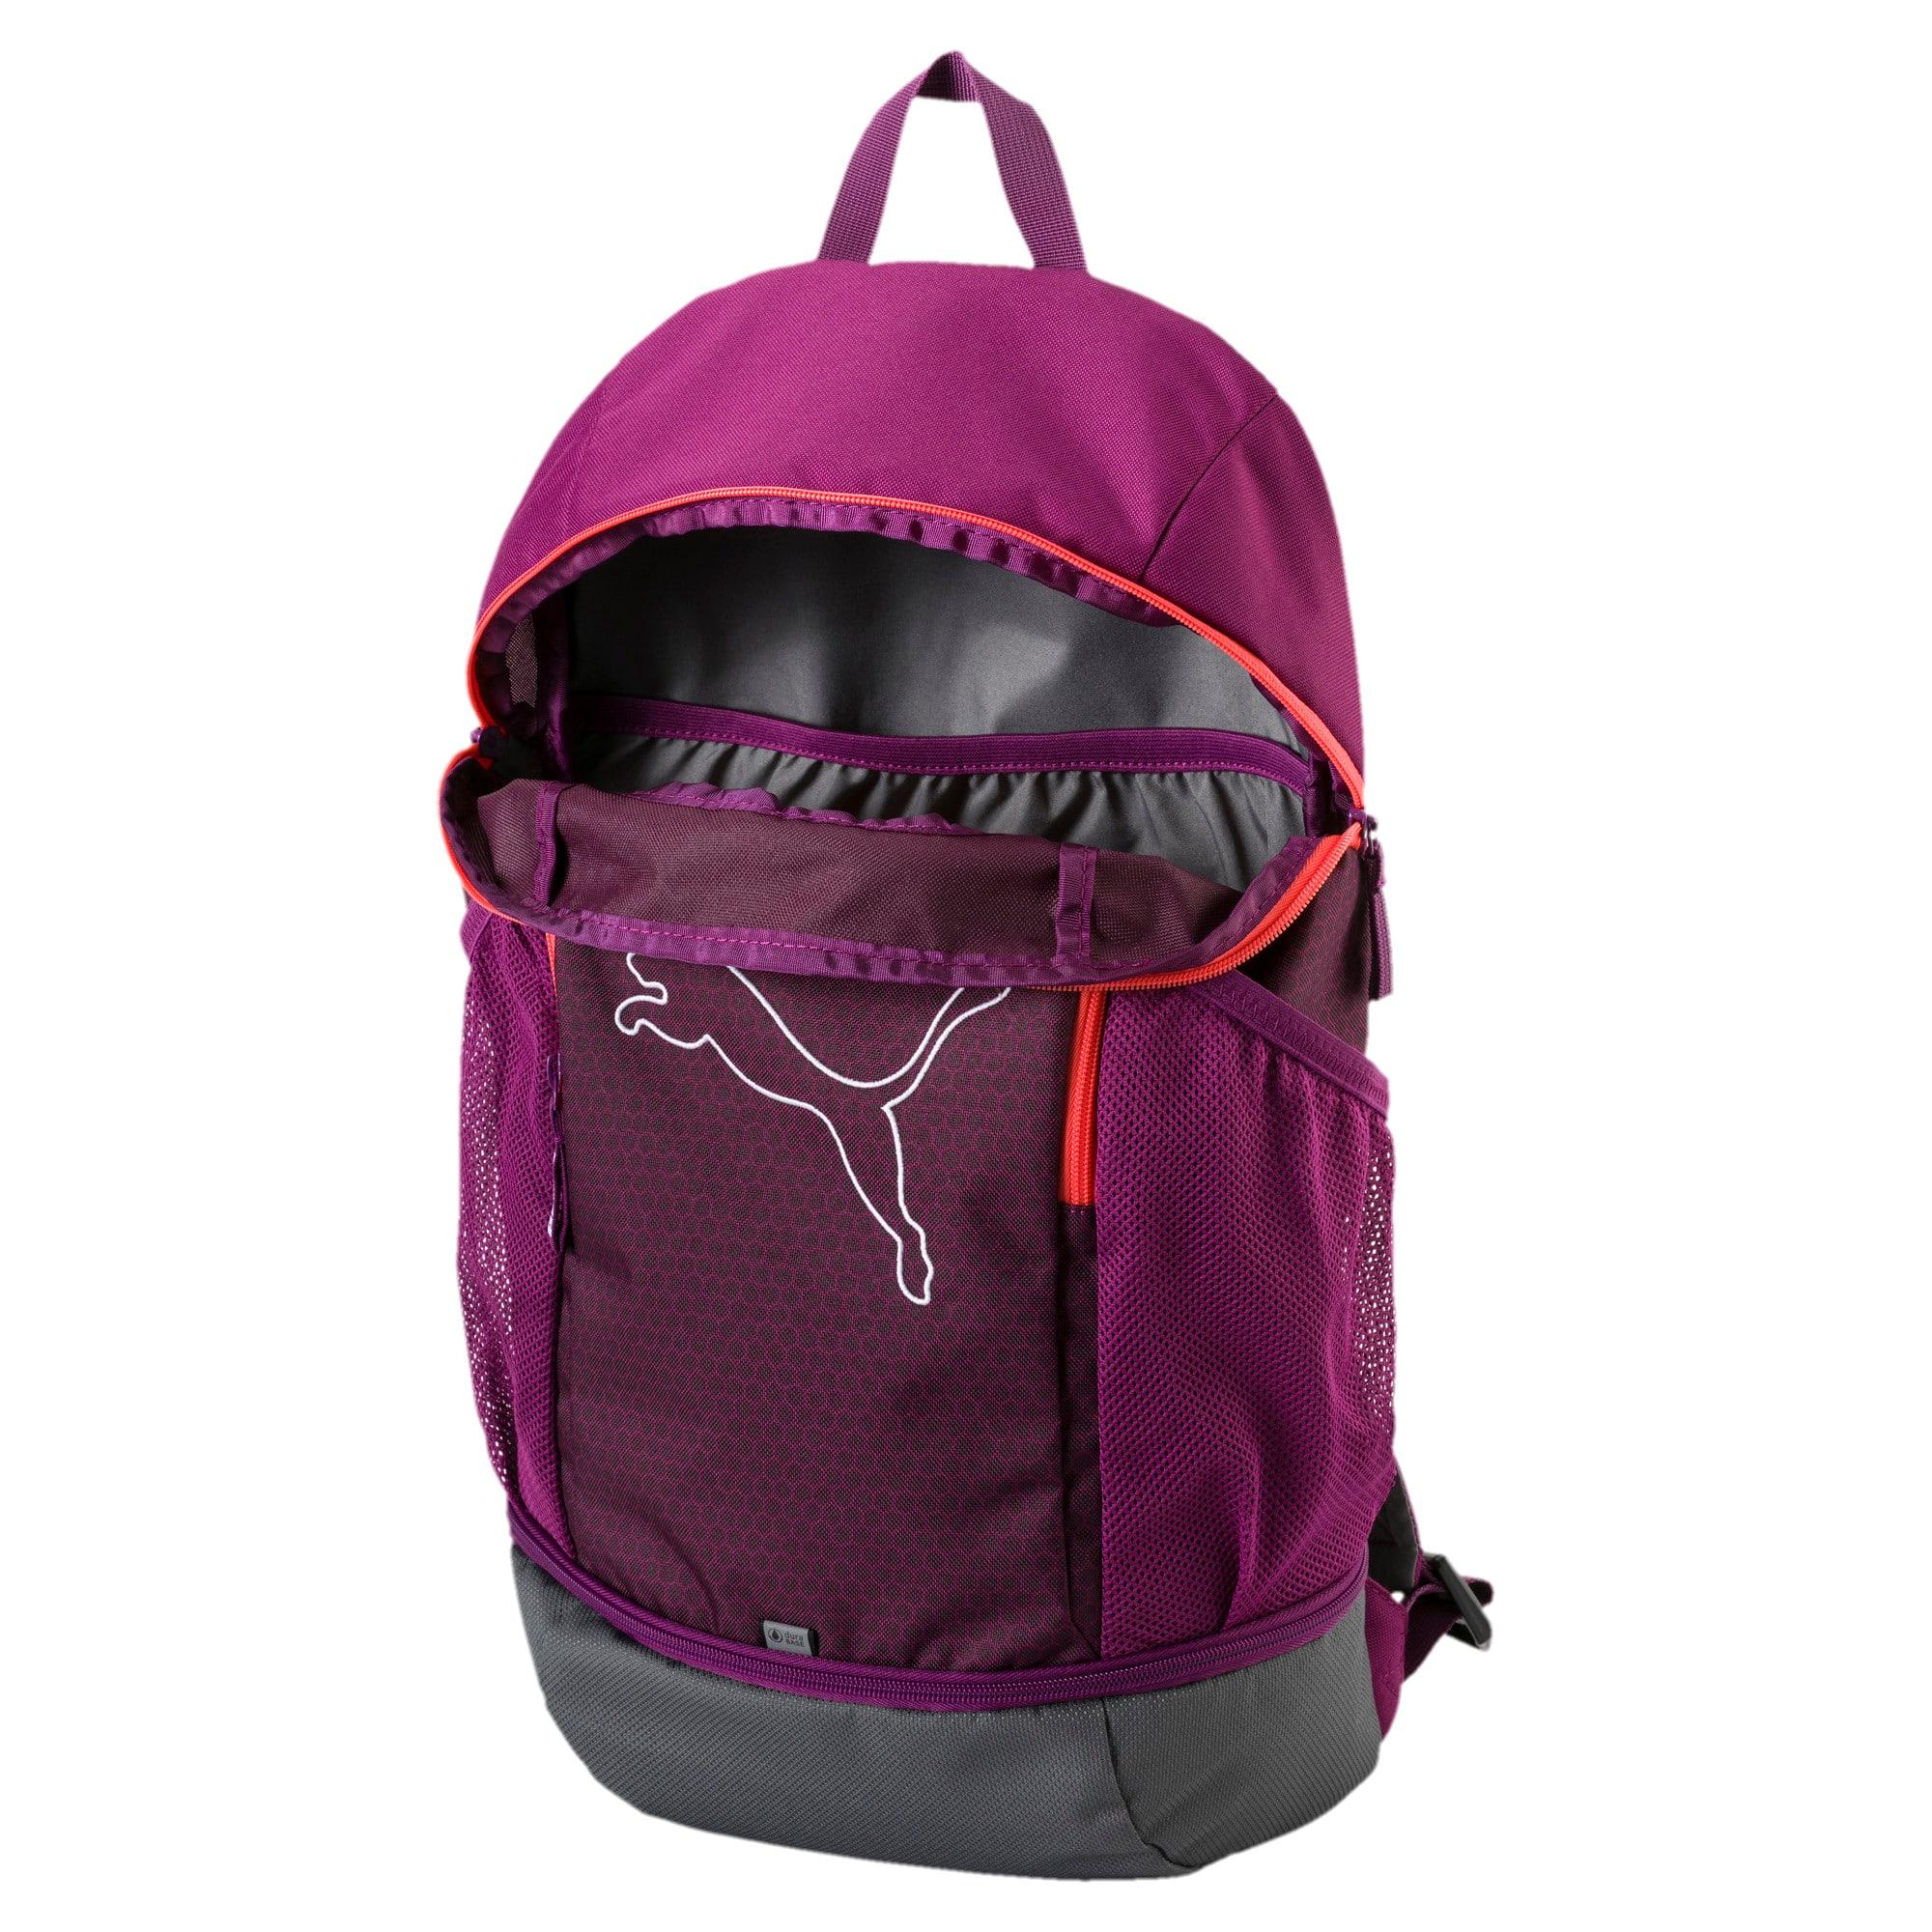 Thumbnail 3 of Echo Backpack, Dark Purple-Hot Coral, medium-IND